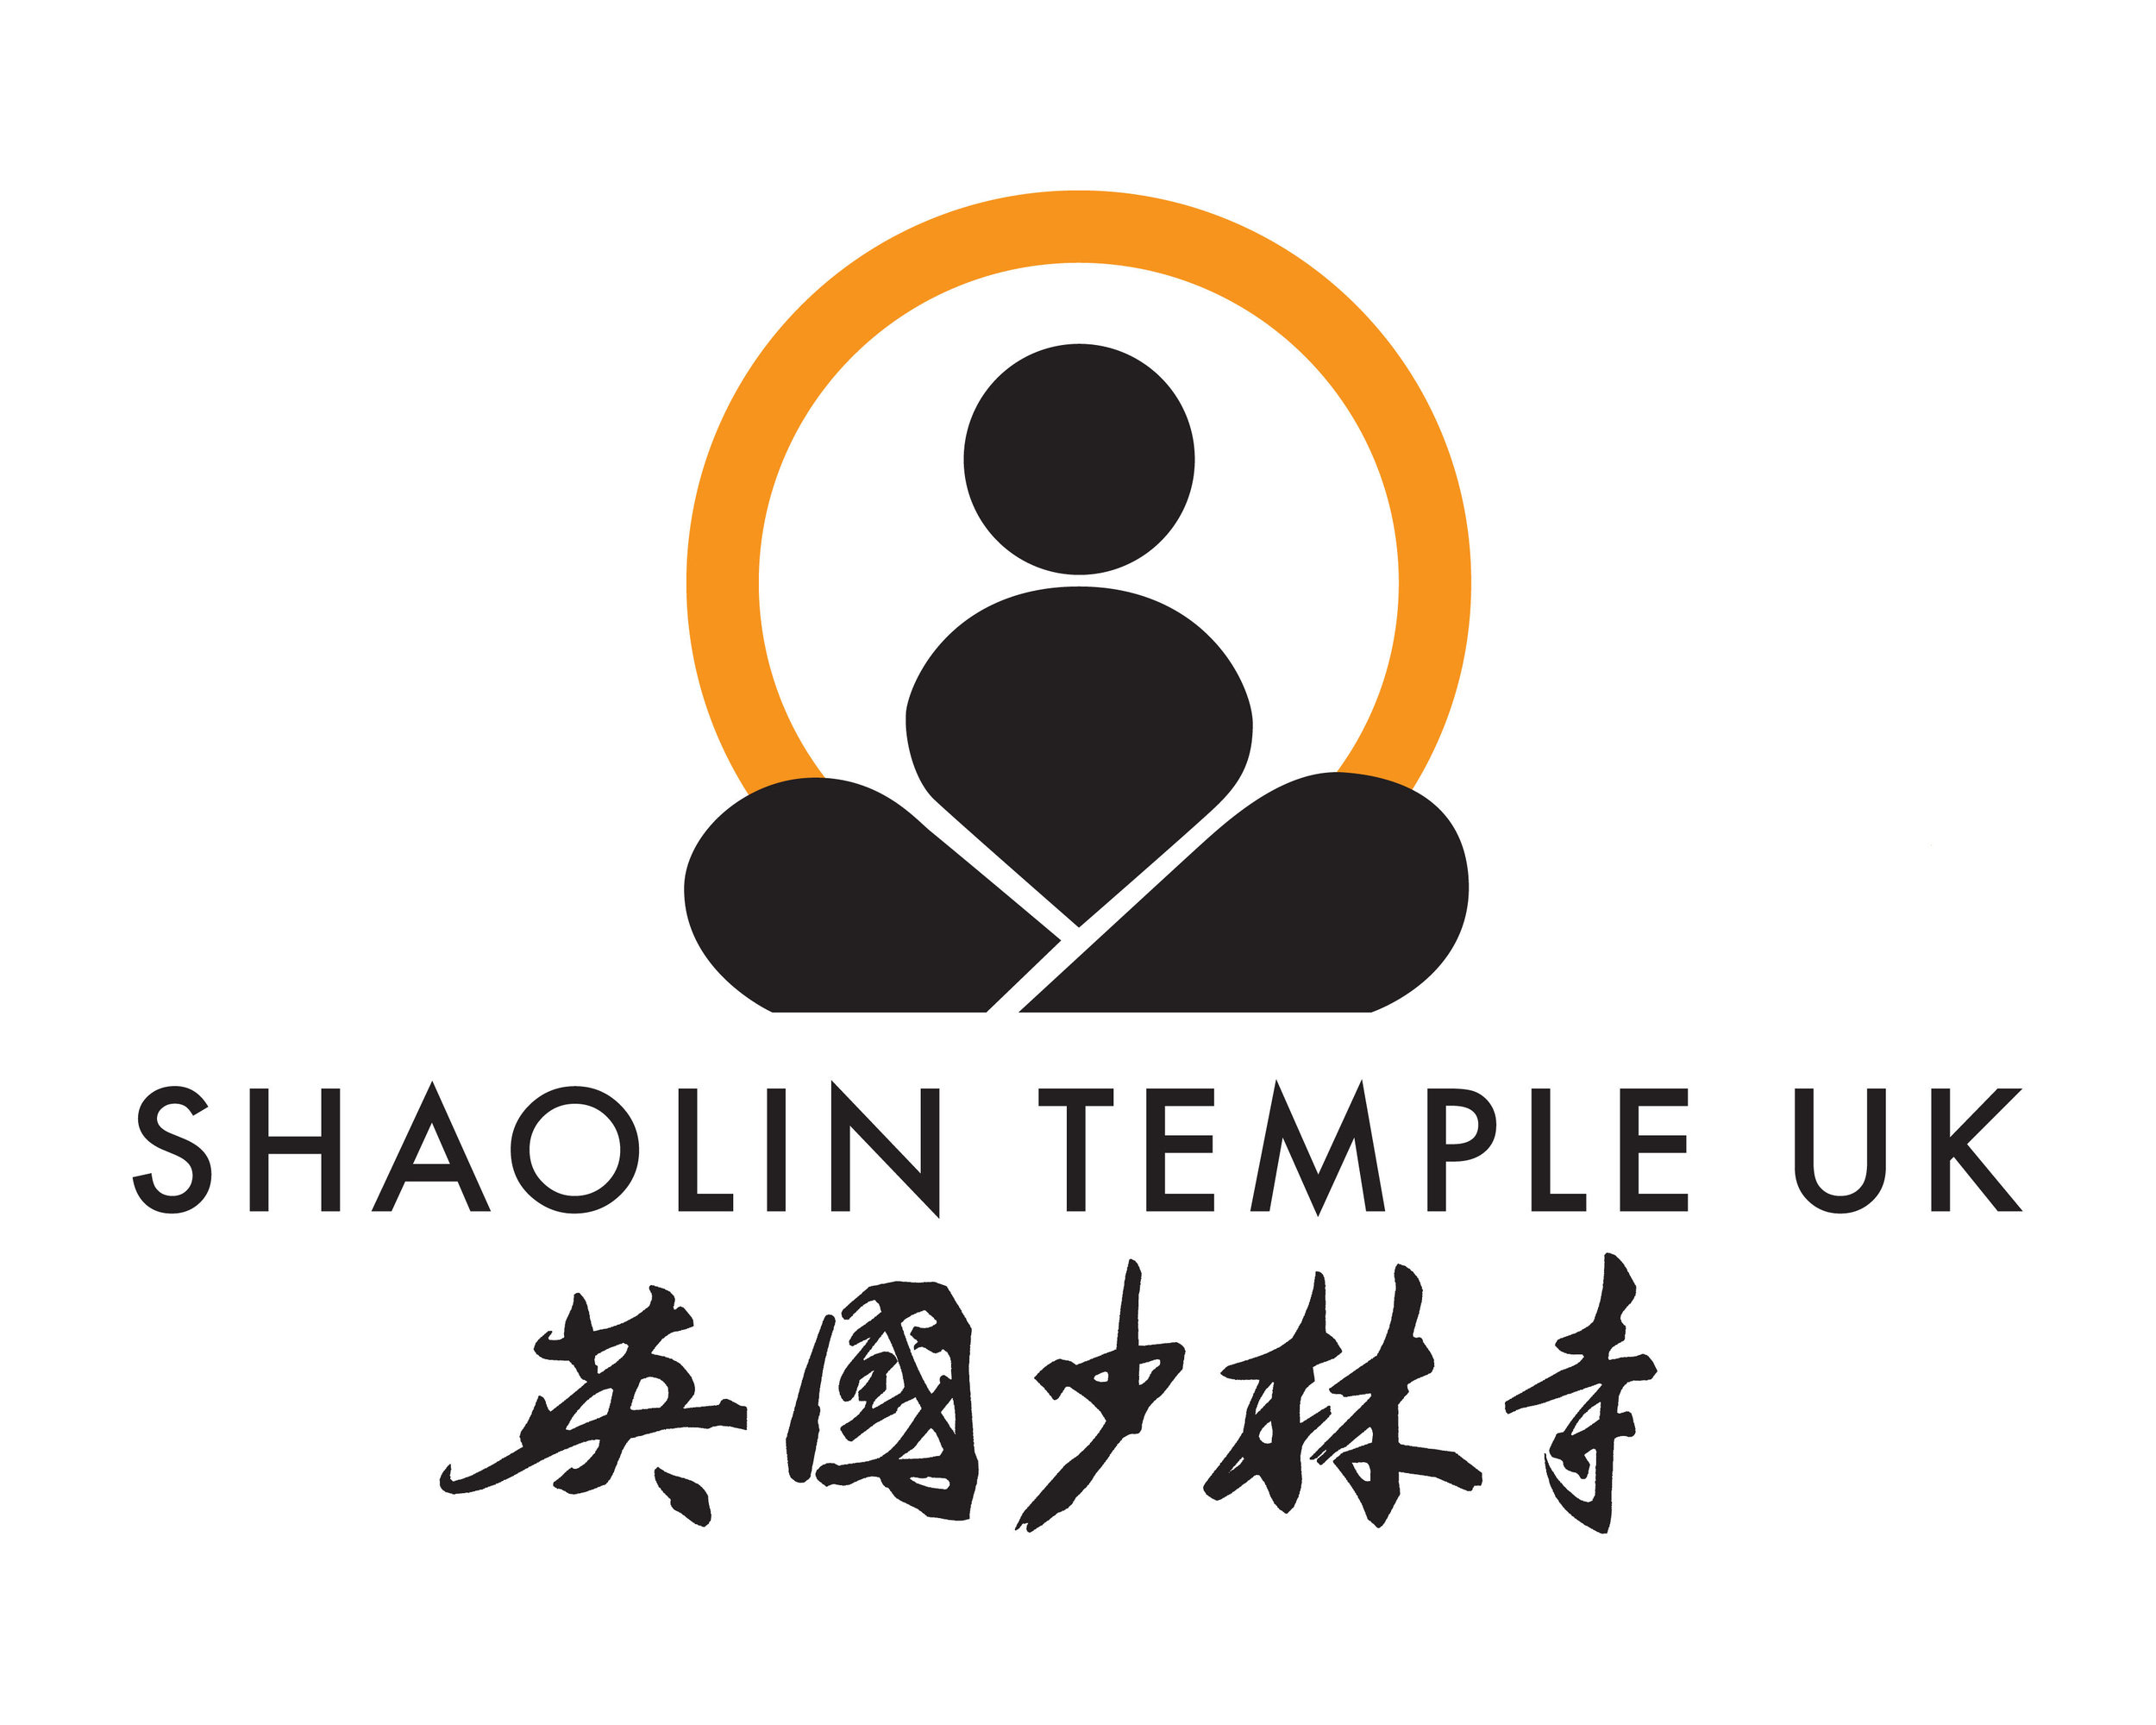 shaolin temple uk.jpg